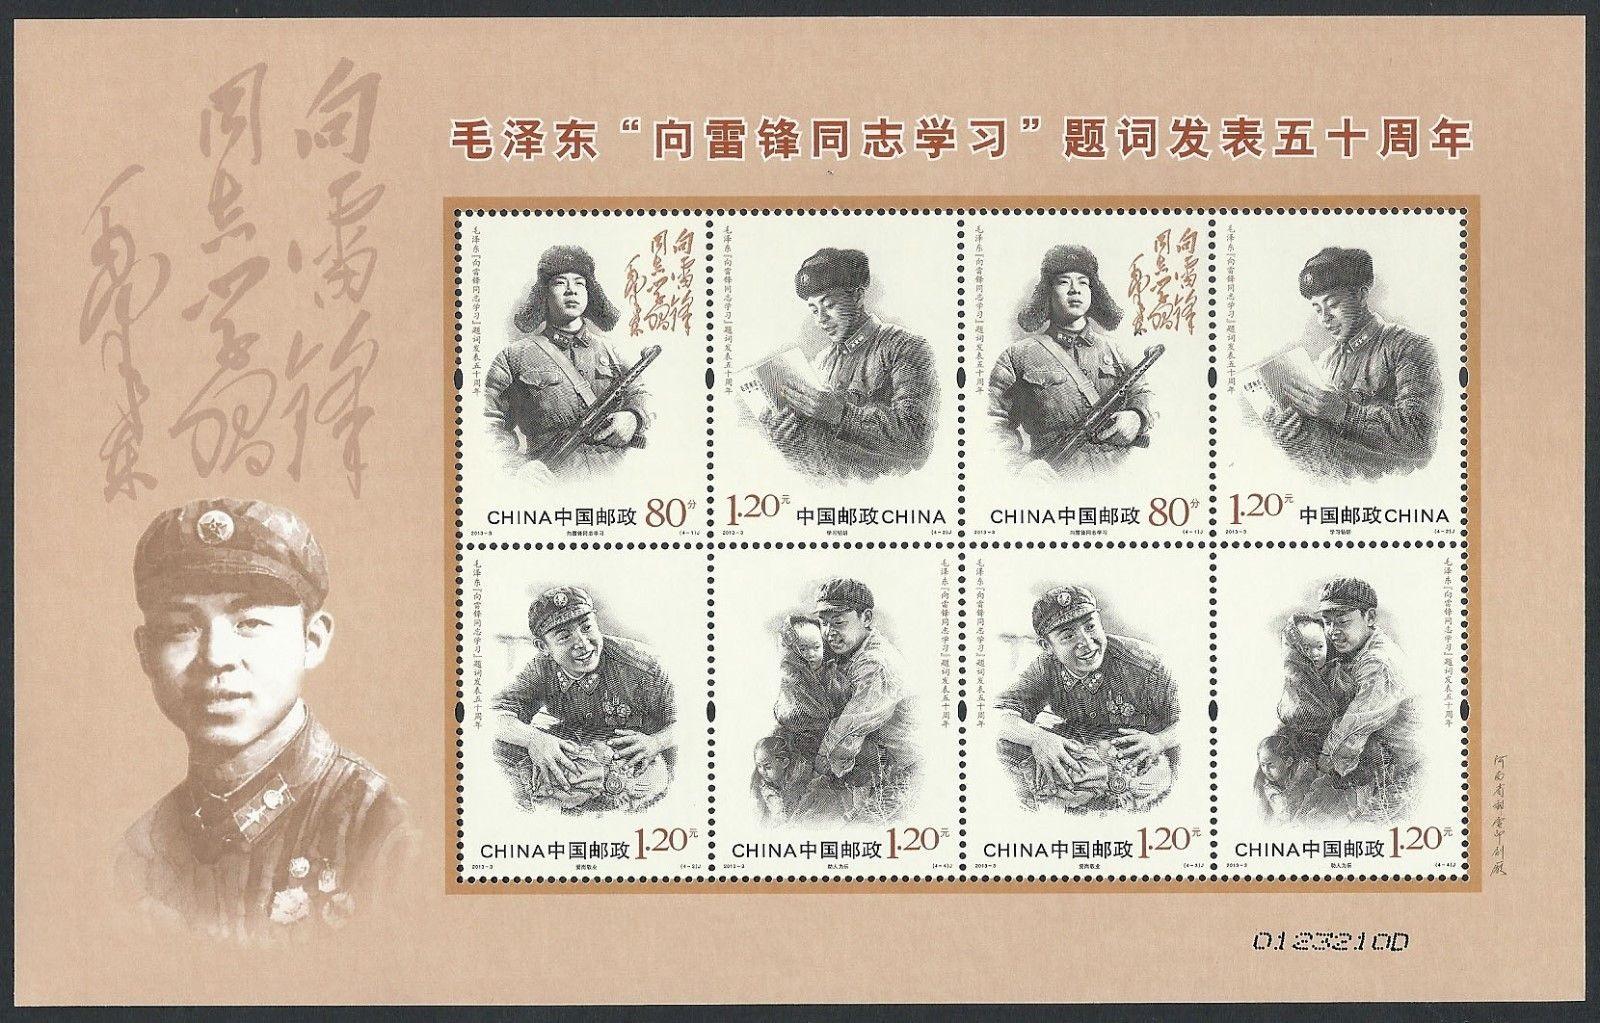 People's Republic of China - Scott #4071a (2013) miniature sheet